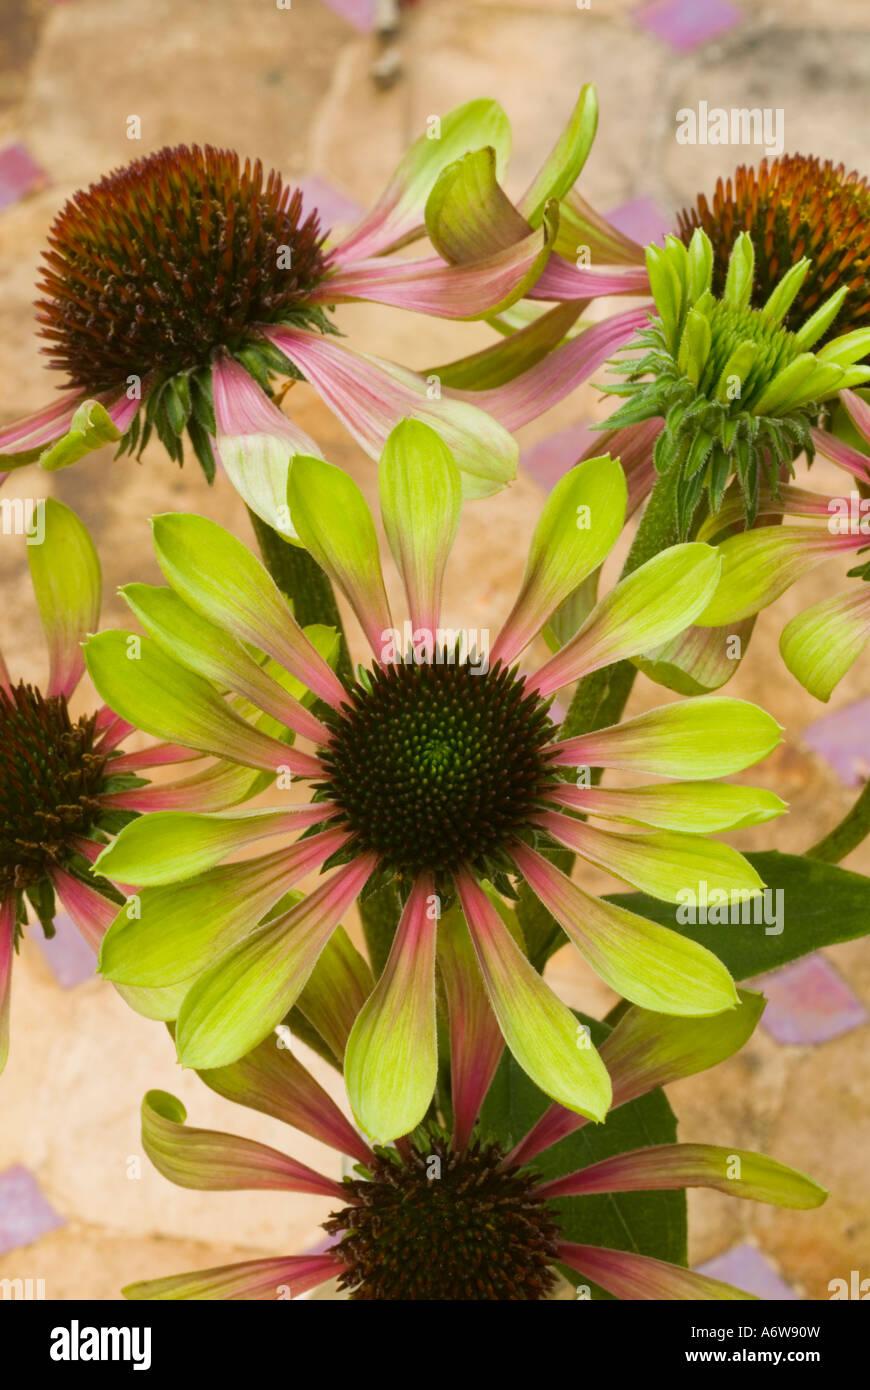 Echinacea purpurea 'Green Envy'™ (Green Purple Coneflowers) flowers arranged against pinkish background - Stock Image